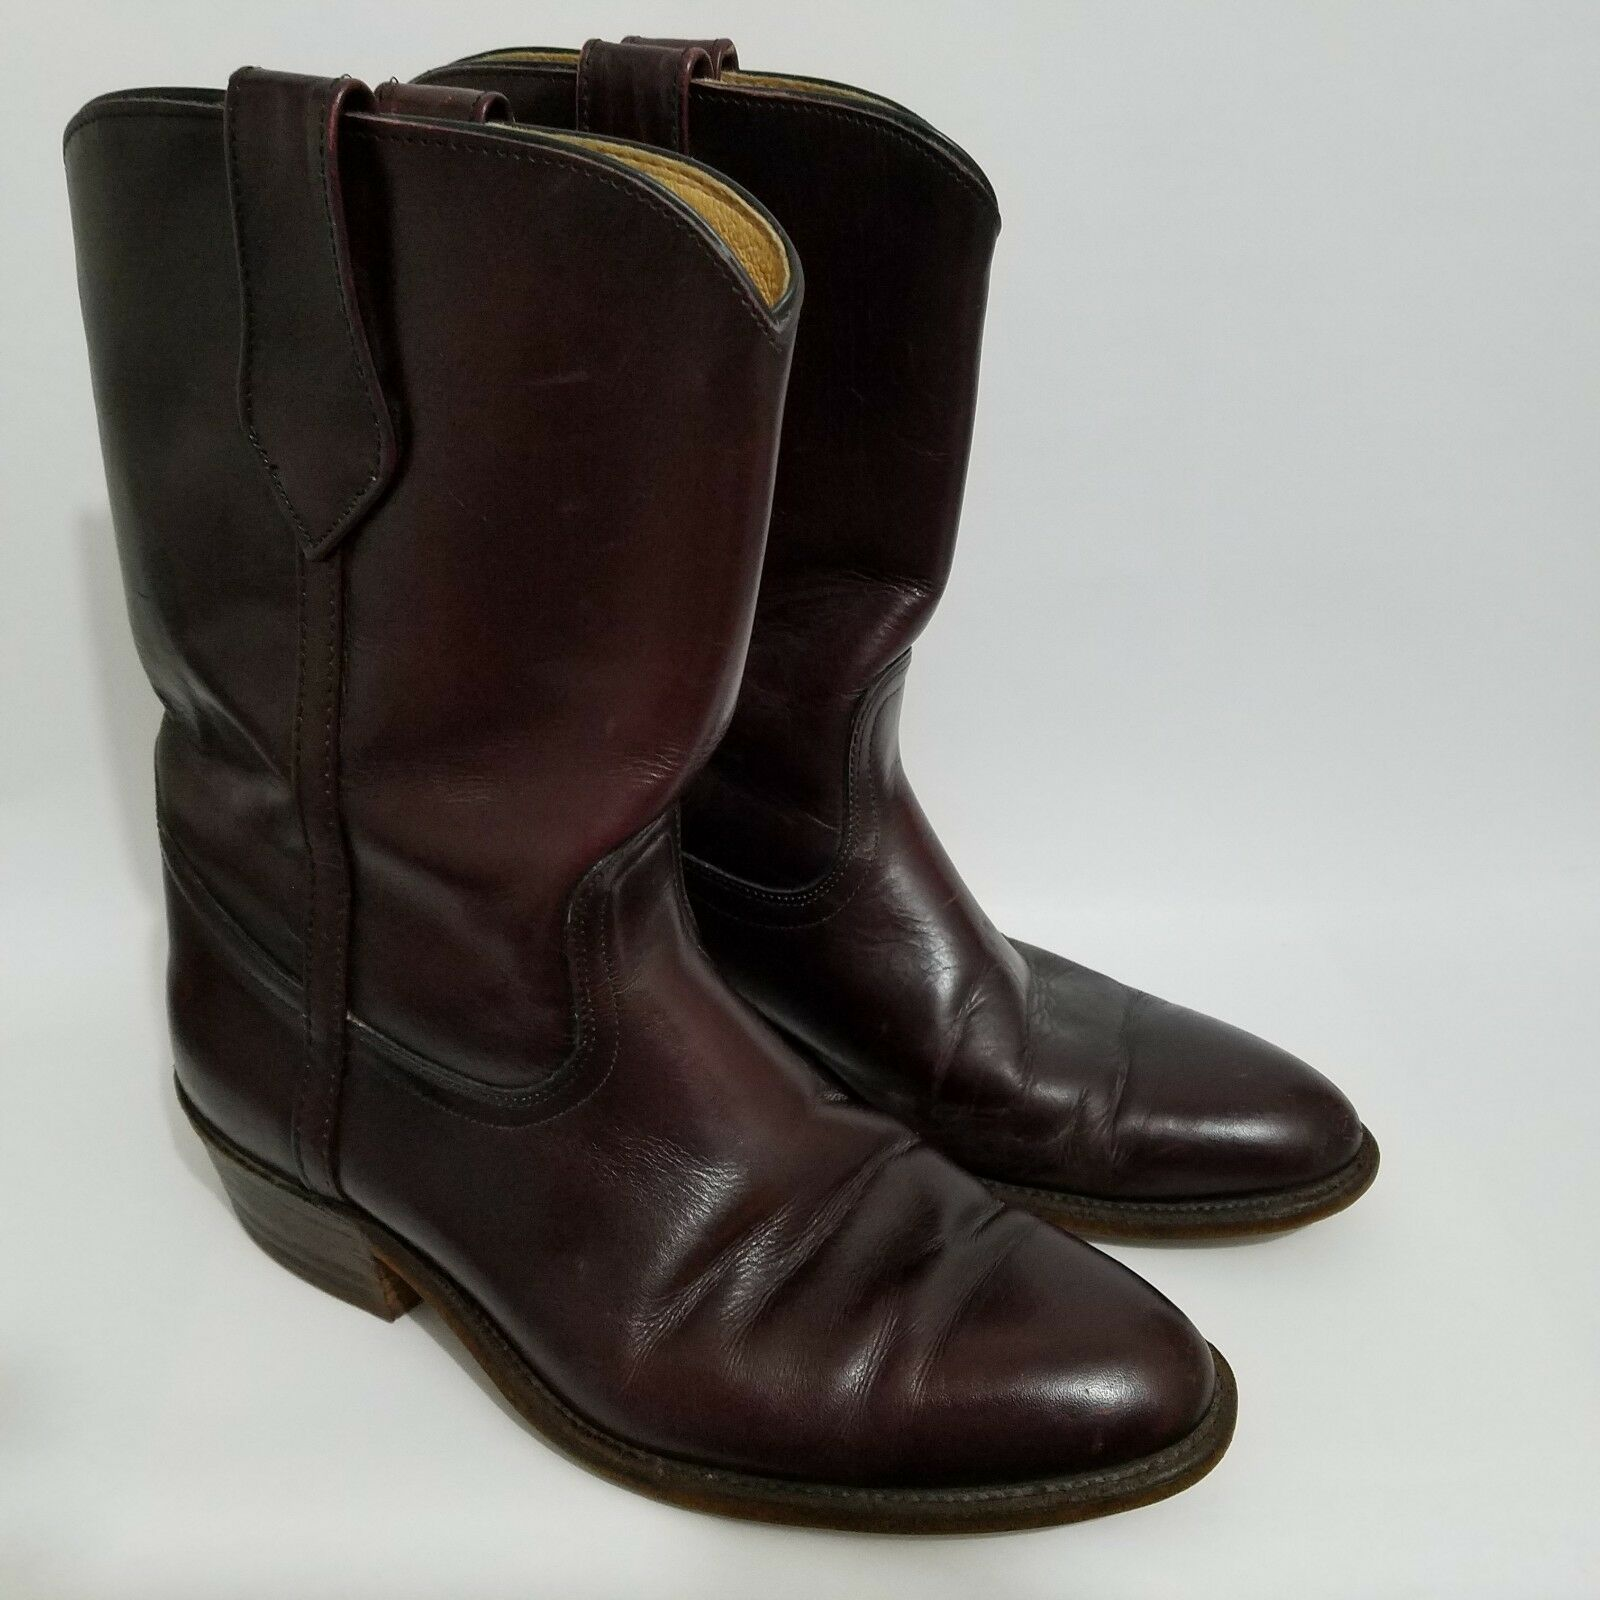 Frye Western Stiefel Mens 9.5 Medium Leather Burgundy rot Point Toe 3150 USA